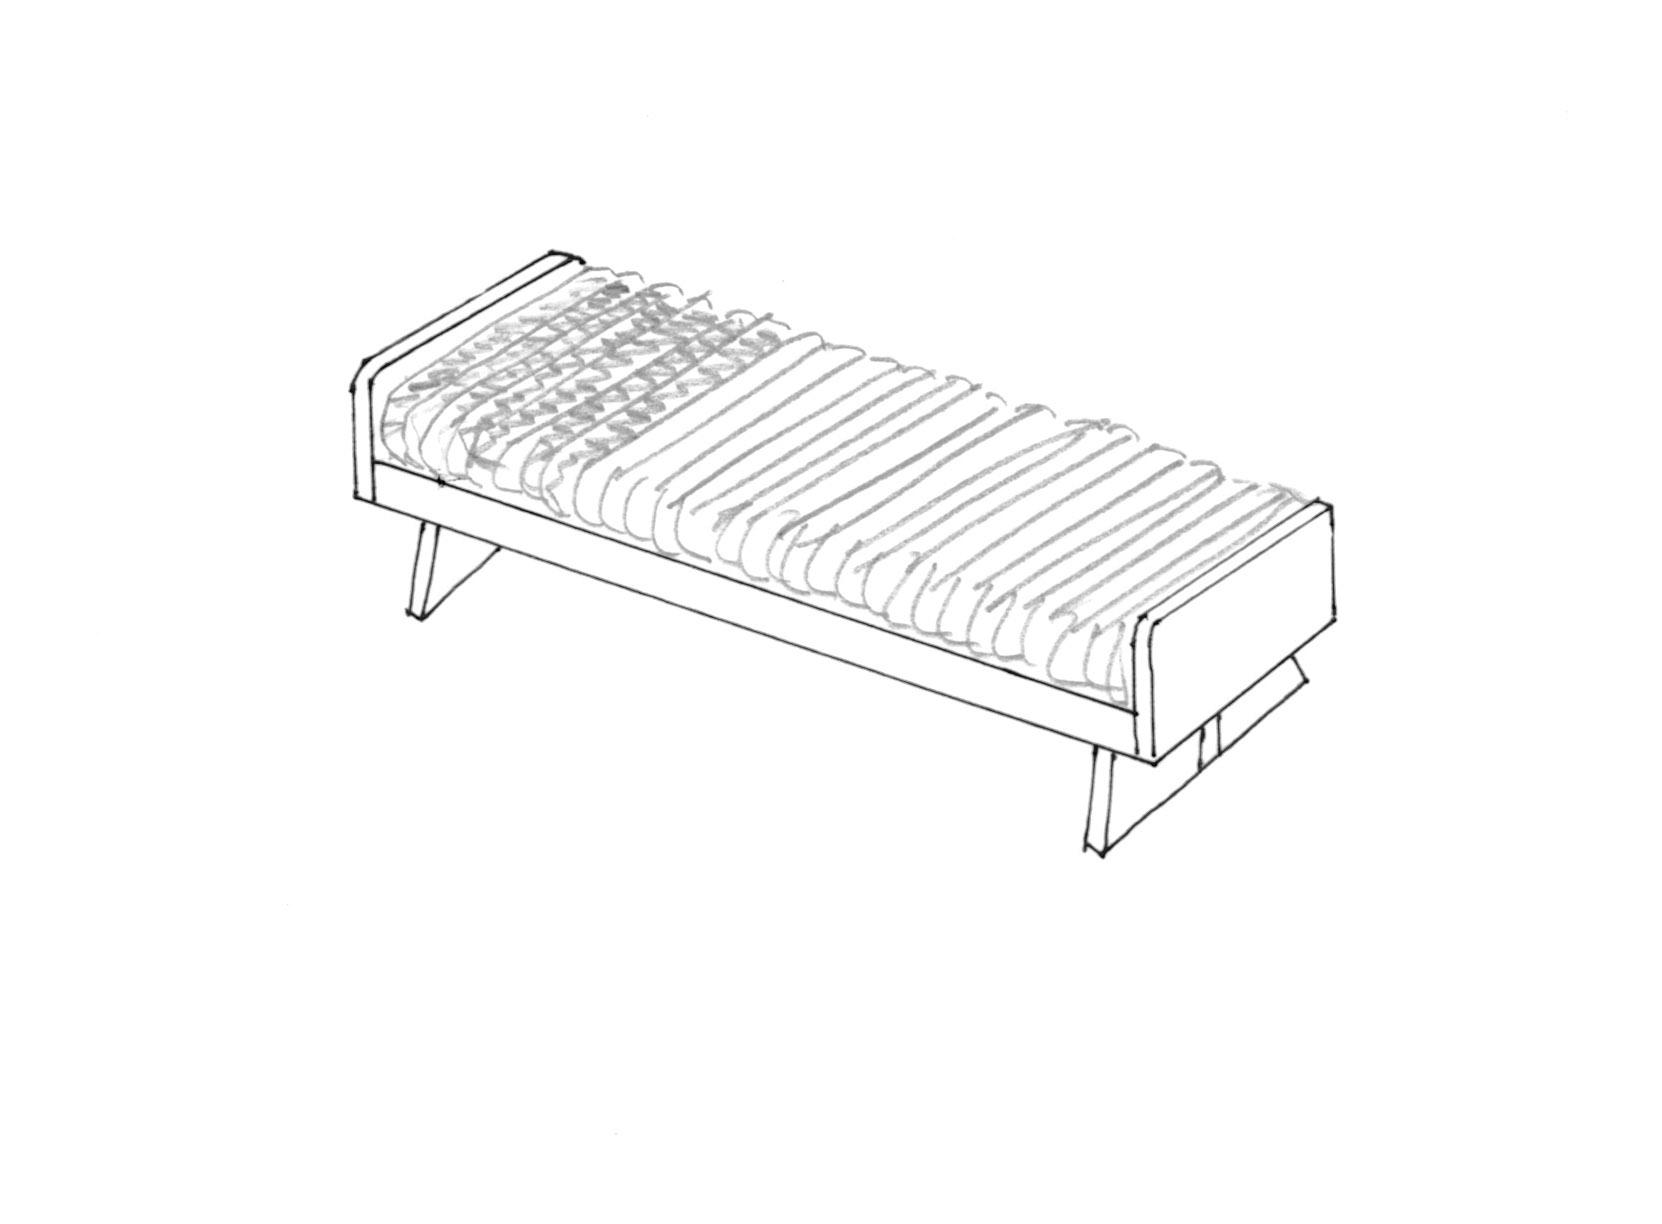 150506-Bench 1-Axo.jpg